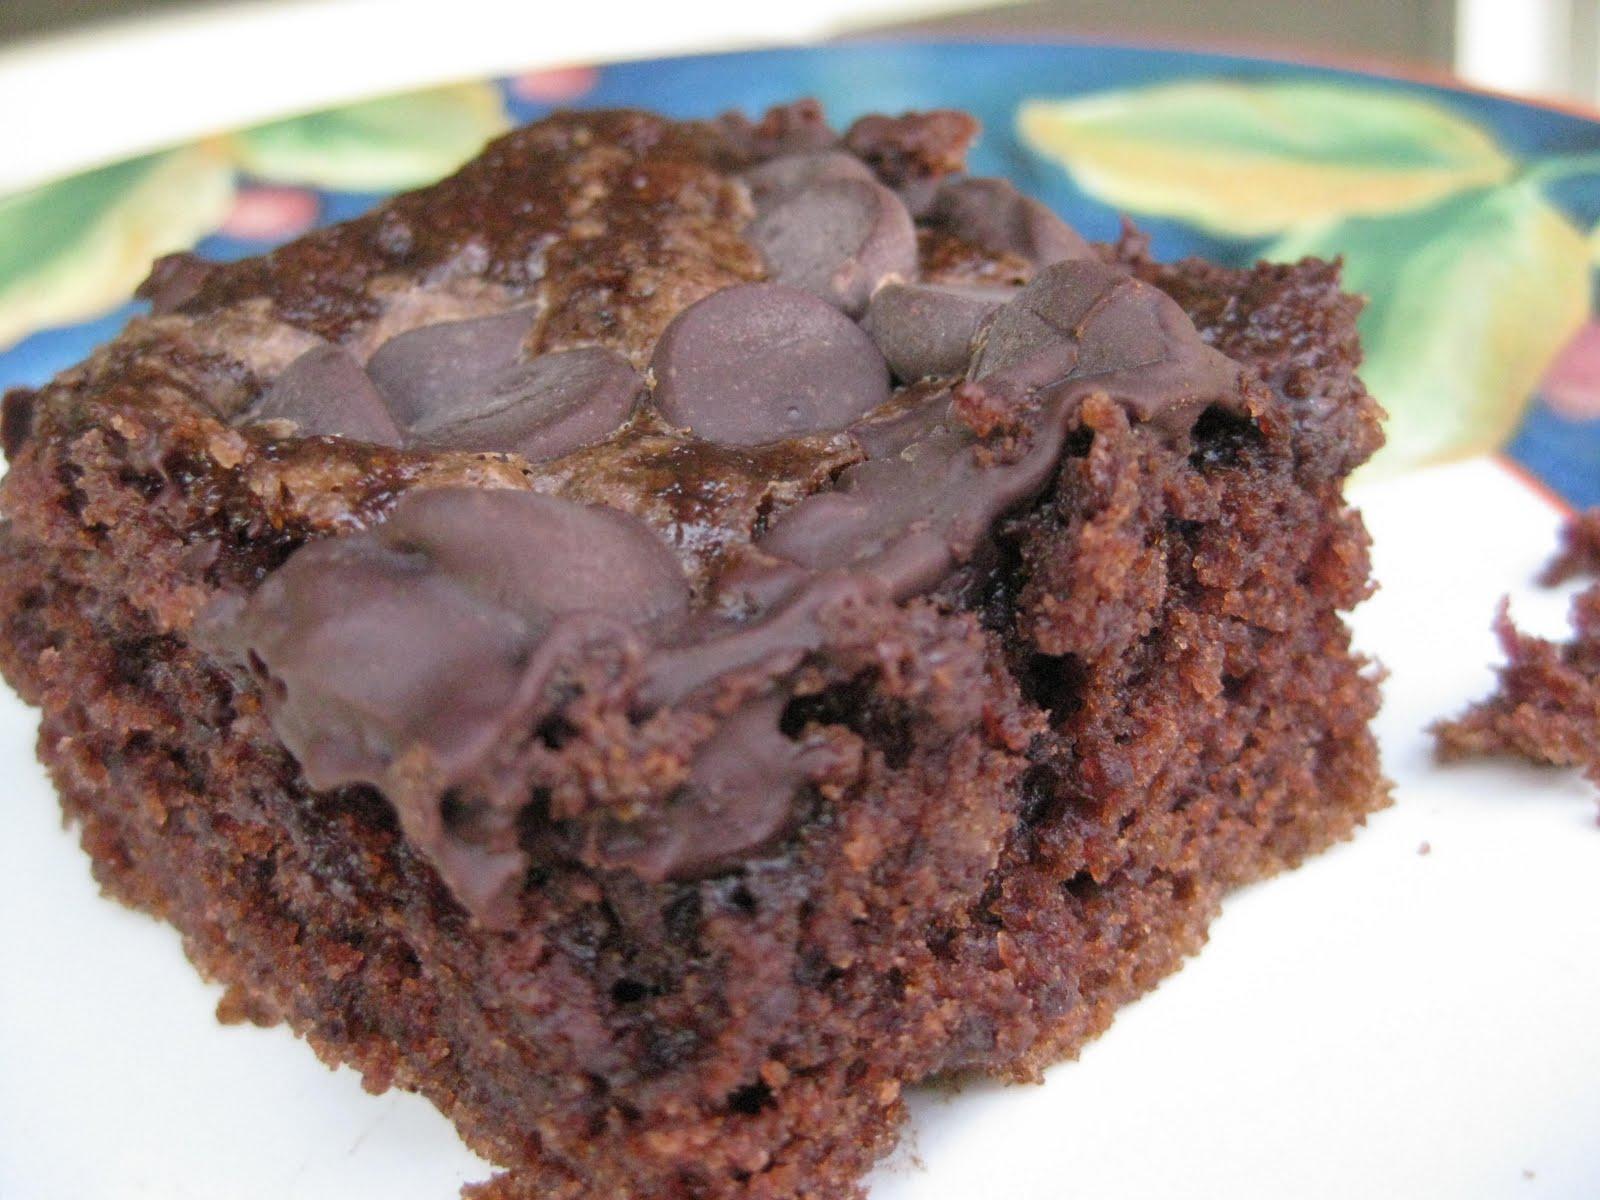 ... chocolate oatmeal cake recipe yummly beetified chocolate oatmeal cake